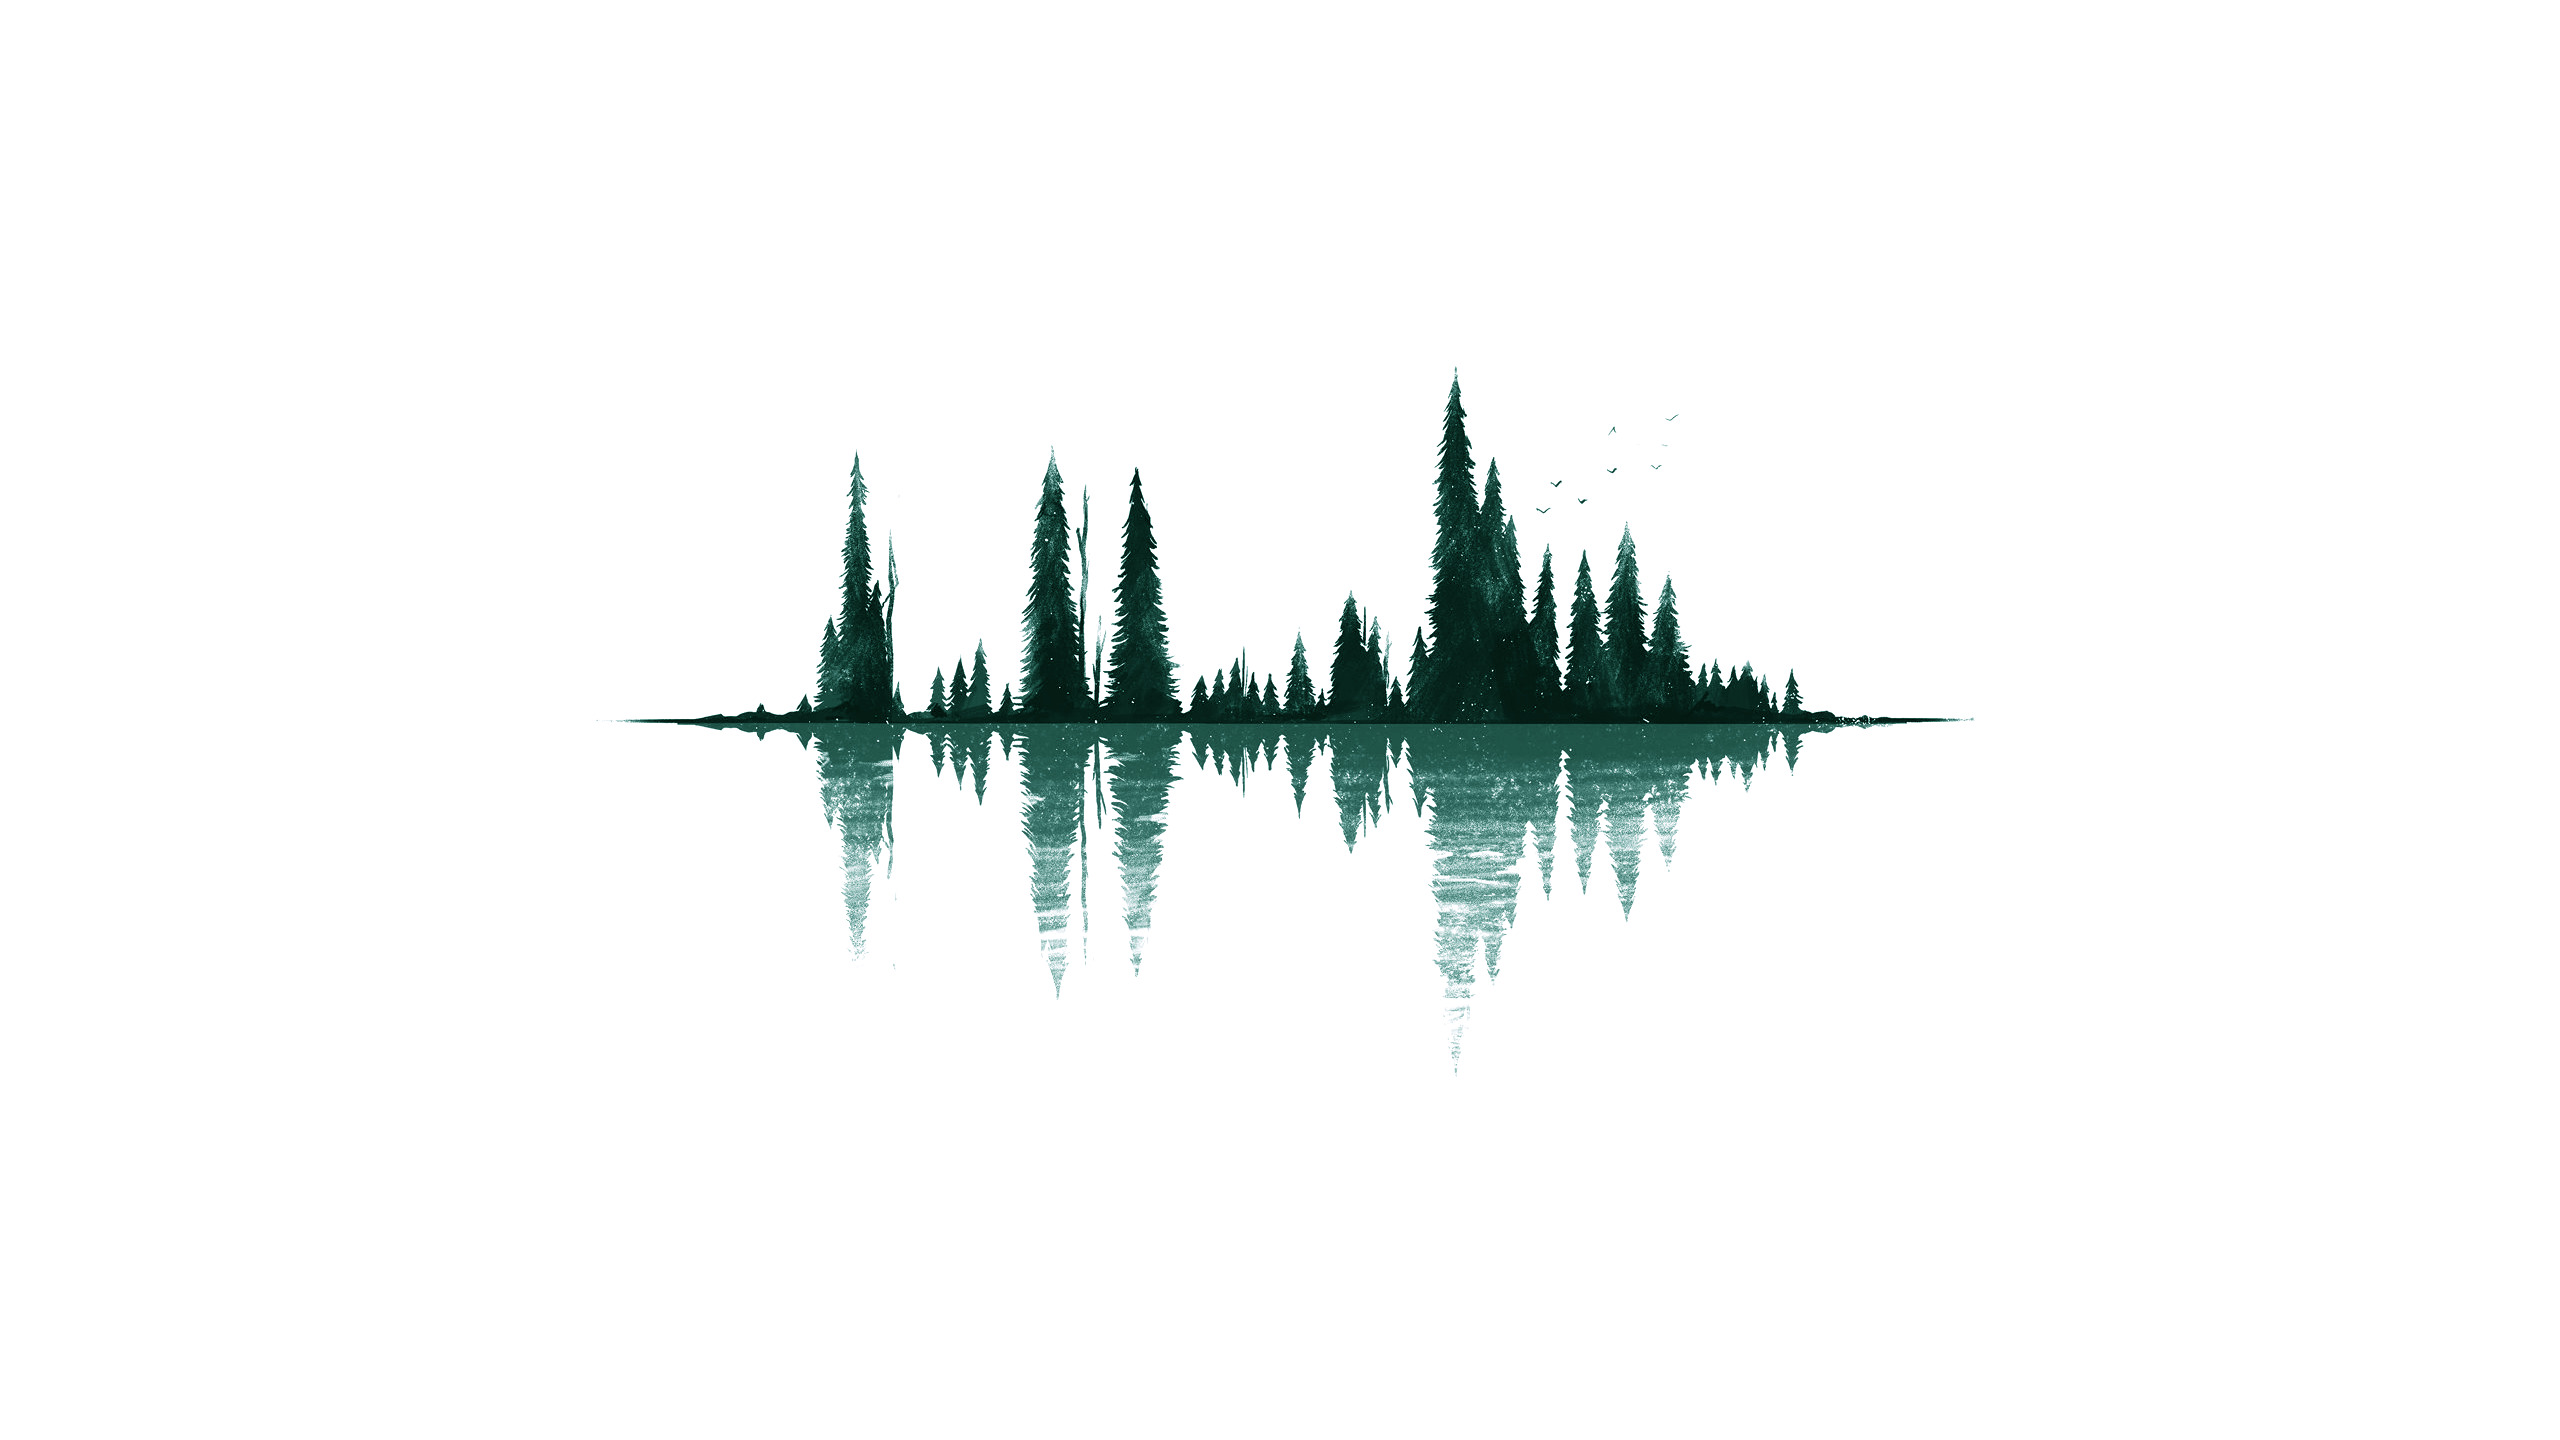 Minimalism, Simple Background, Digital Art, Reflection, - Desktop Wallpaper Minimalist Forest , HD Wallpaper & Backgrounds